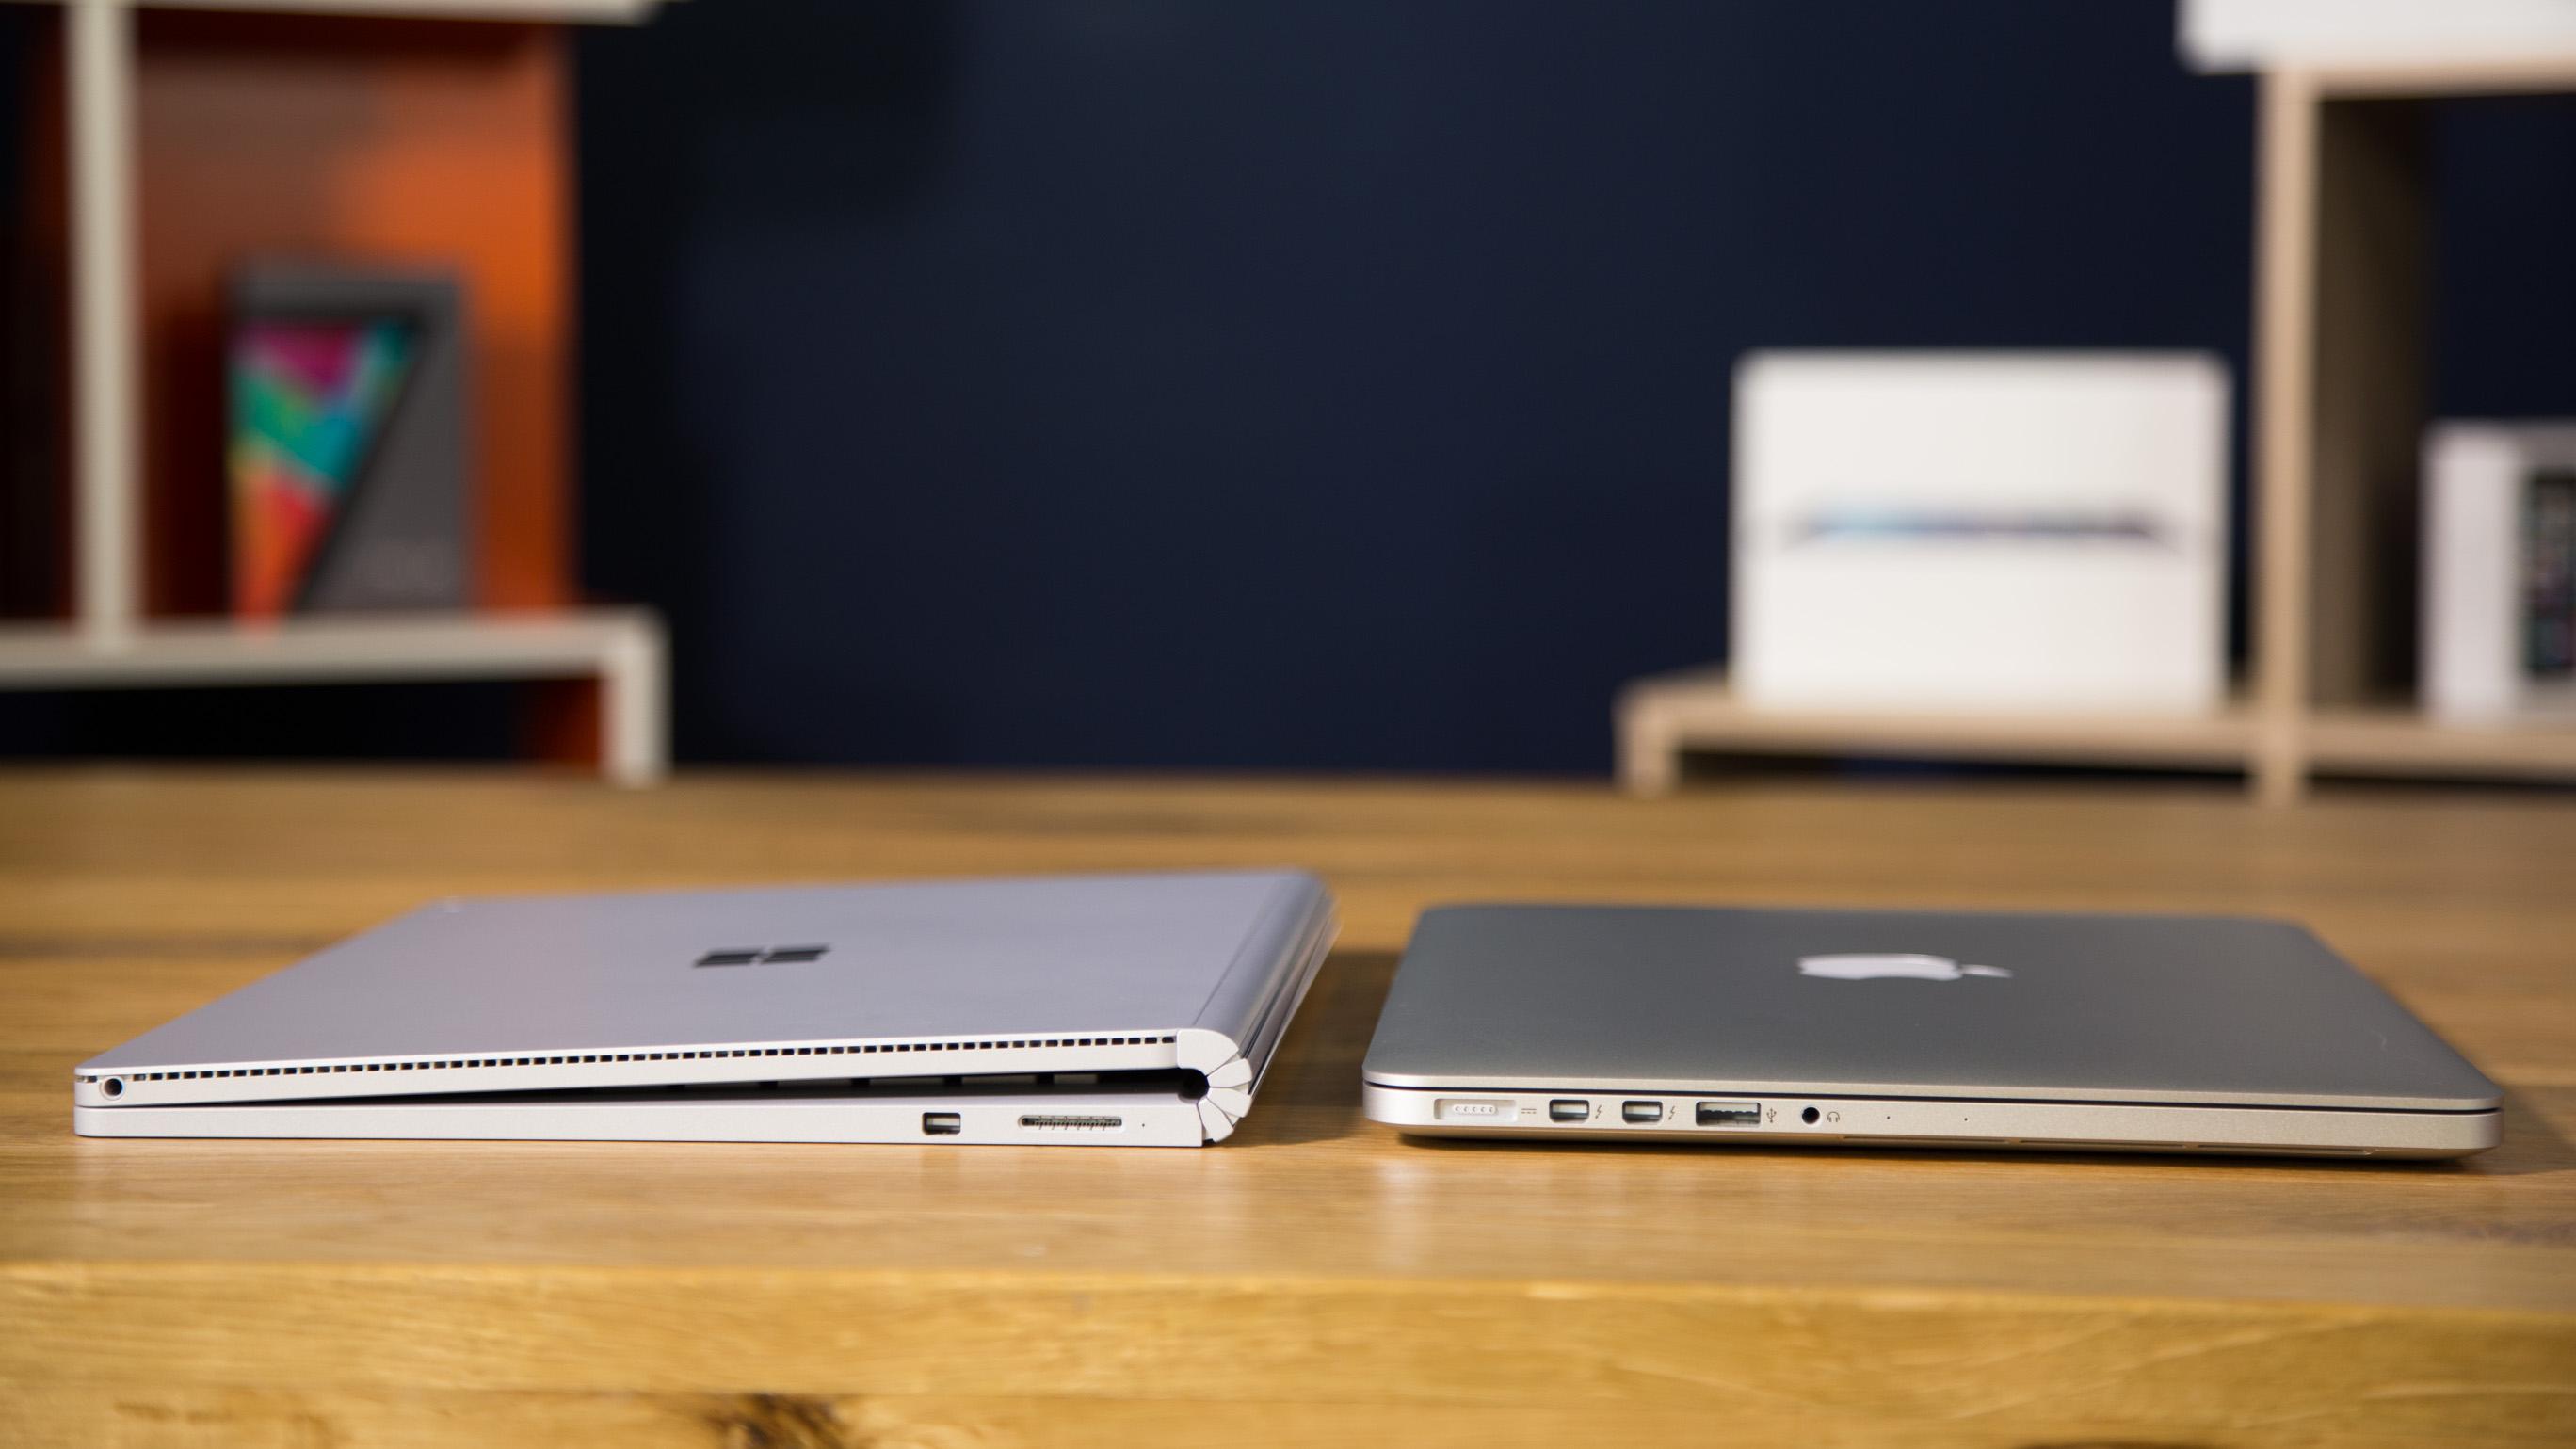 Surface vs. MacBook